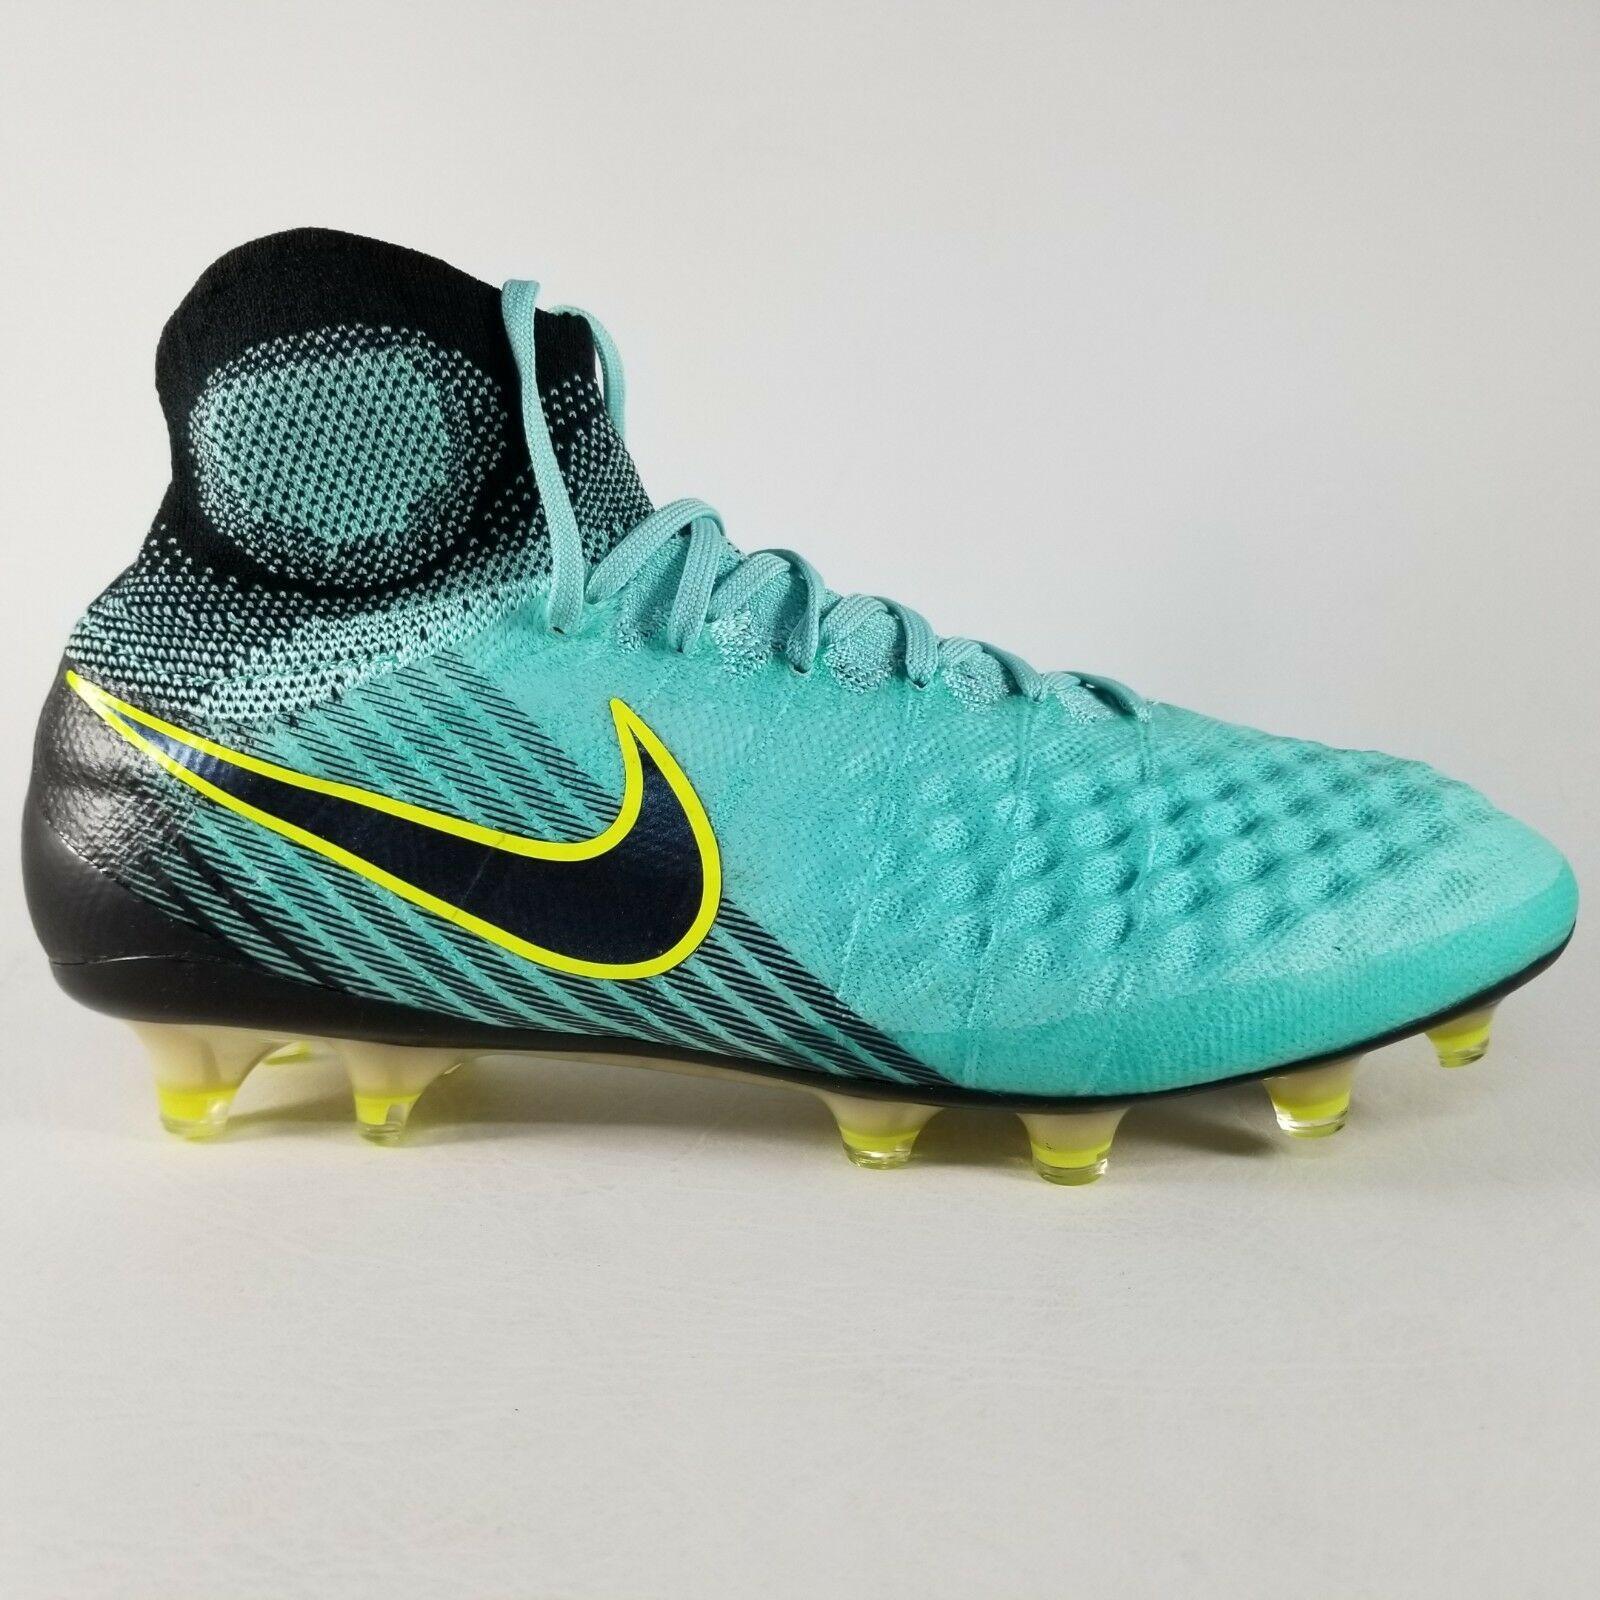 95a0328b48d Nike Magista Obra II 2 FG Soccer Cleats SZ 10 Womens Boots Green Black Mens  8.5